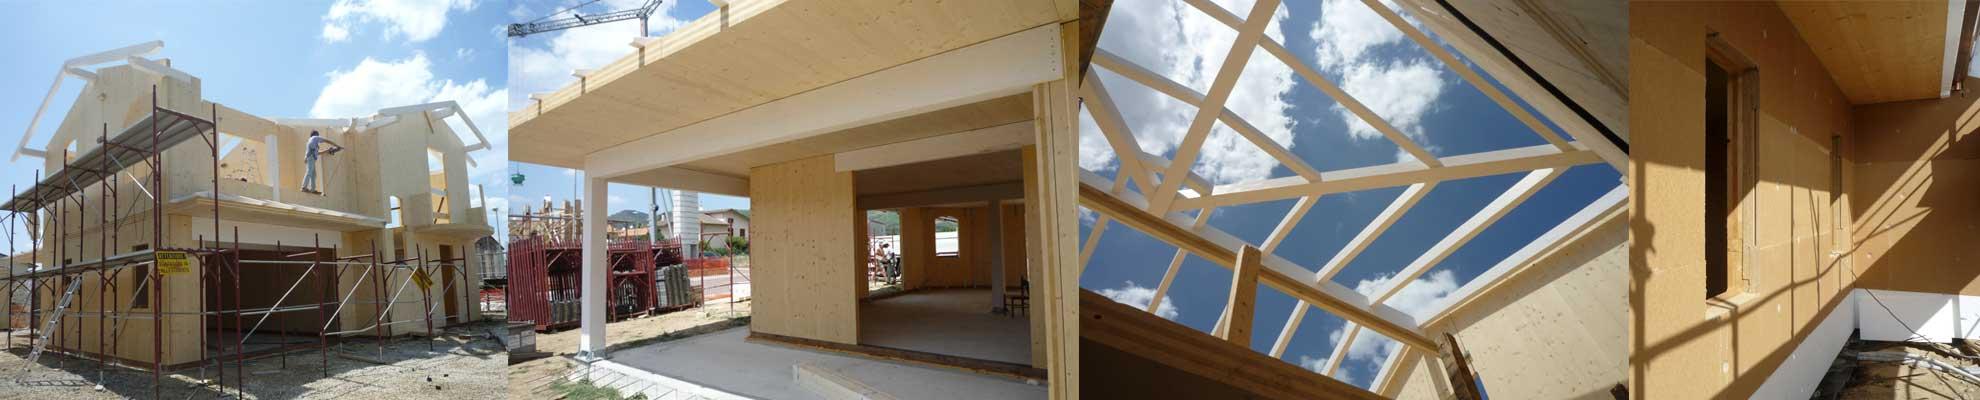 Casa a due piani umbertide umbria costantini sistema for Moderni piani di casa eco